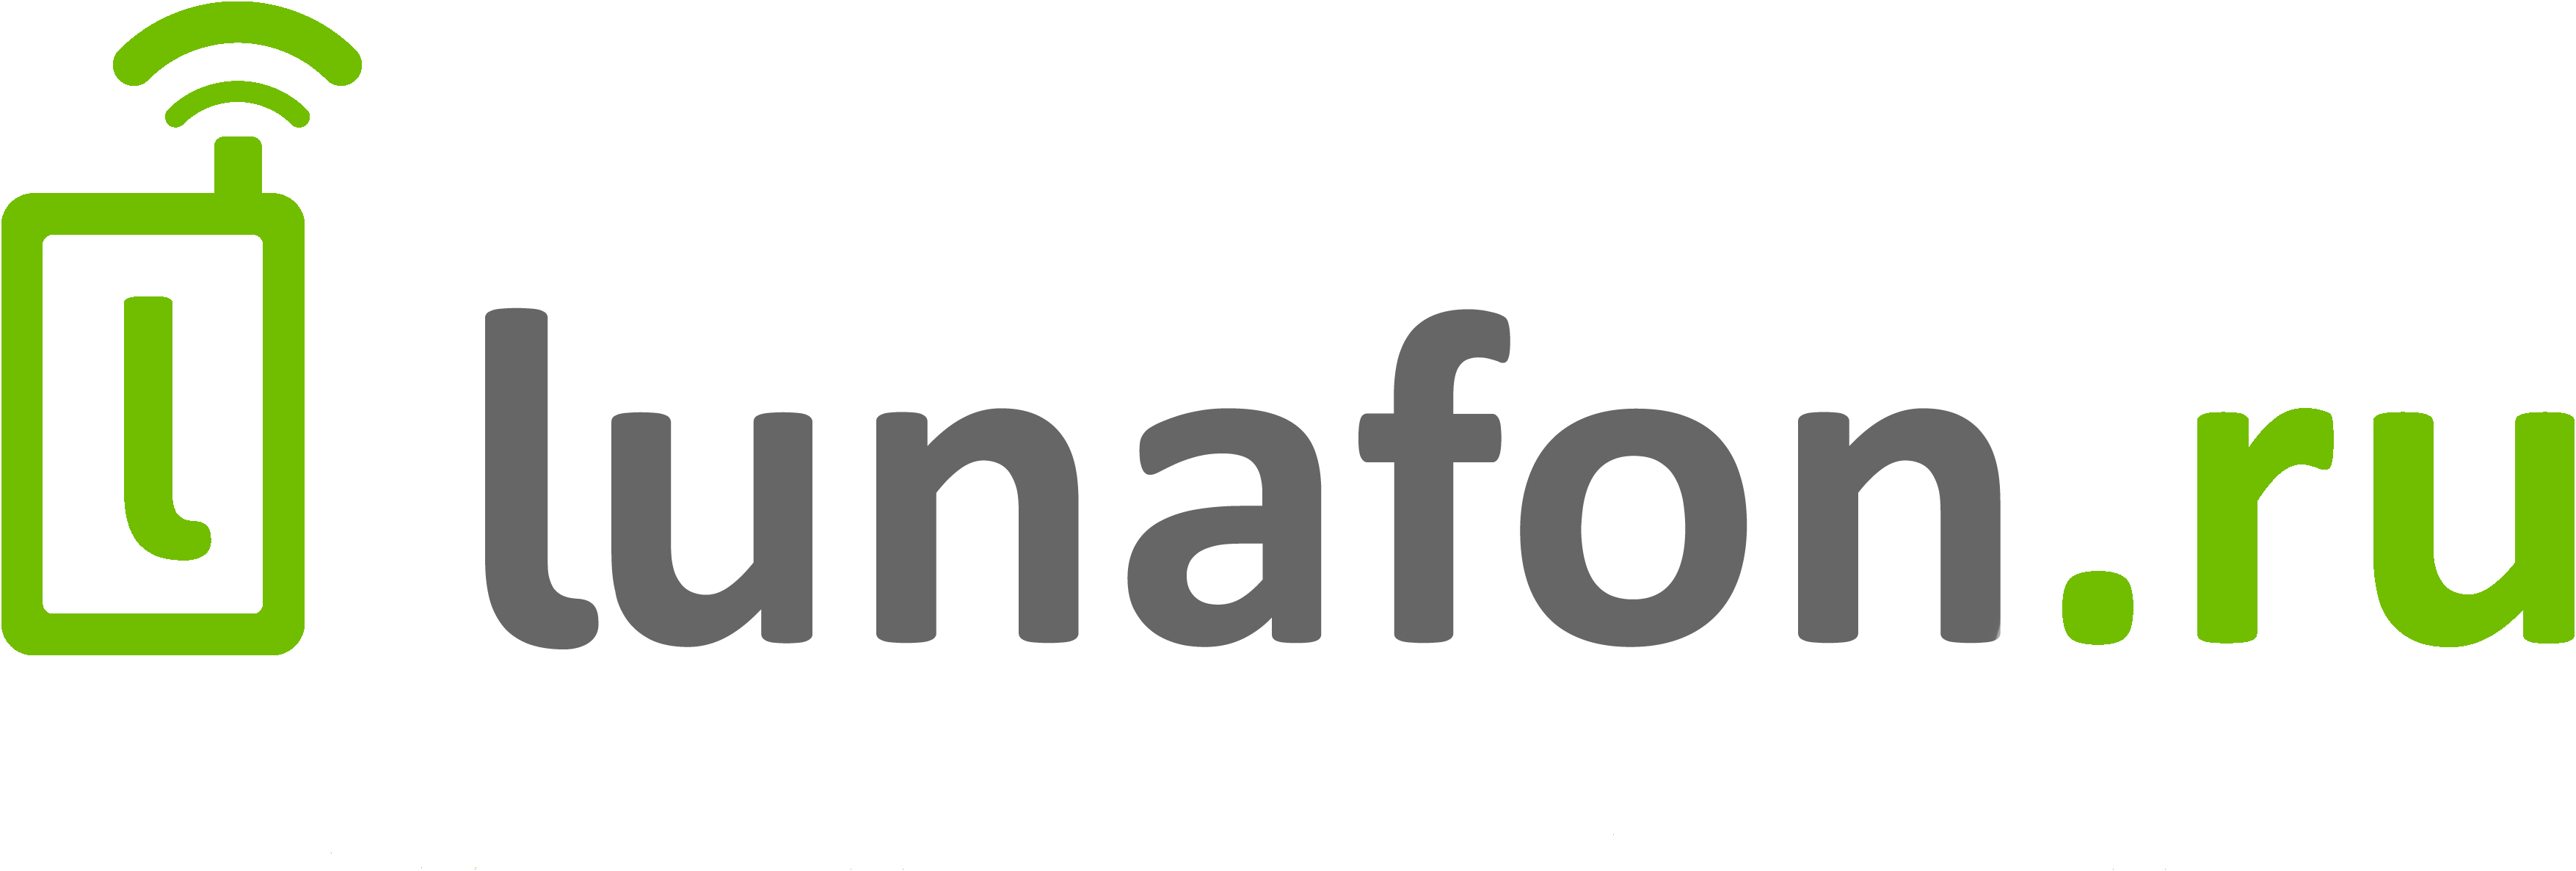 Интернет-магазин смартфонов и планшетов Lunafon.ru